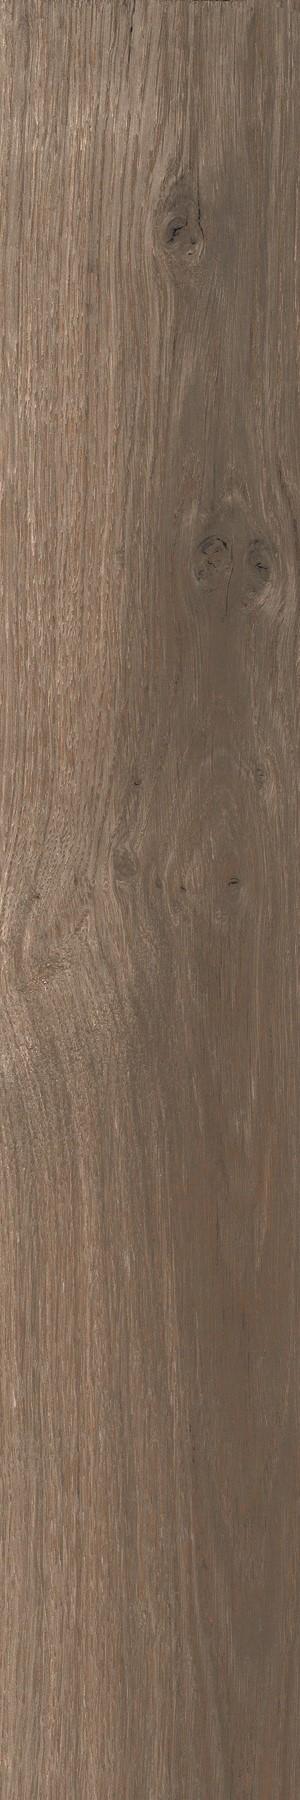 Potenza-bruin-15x90